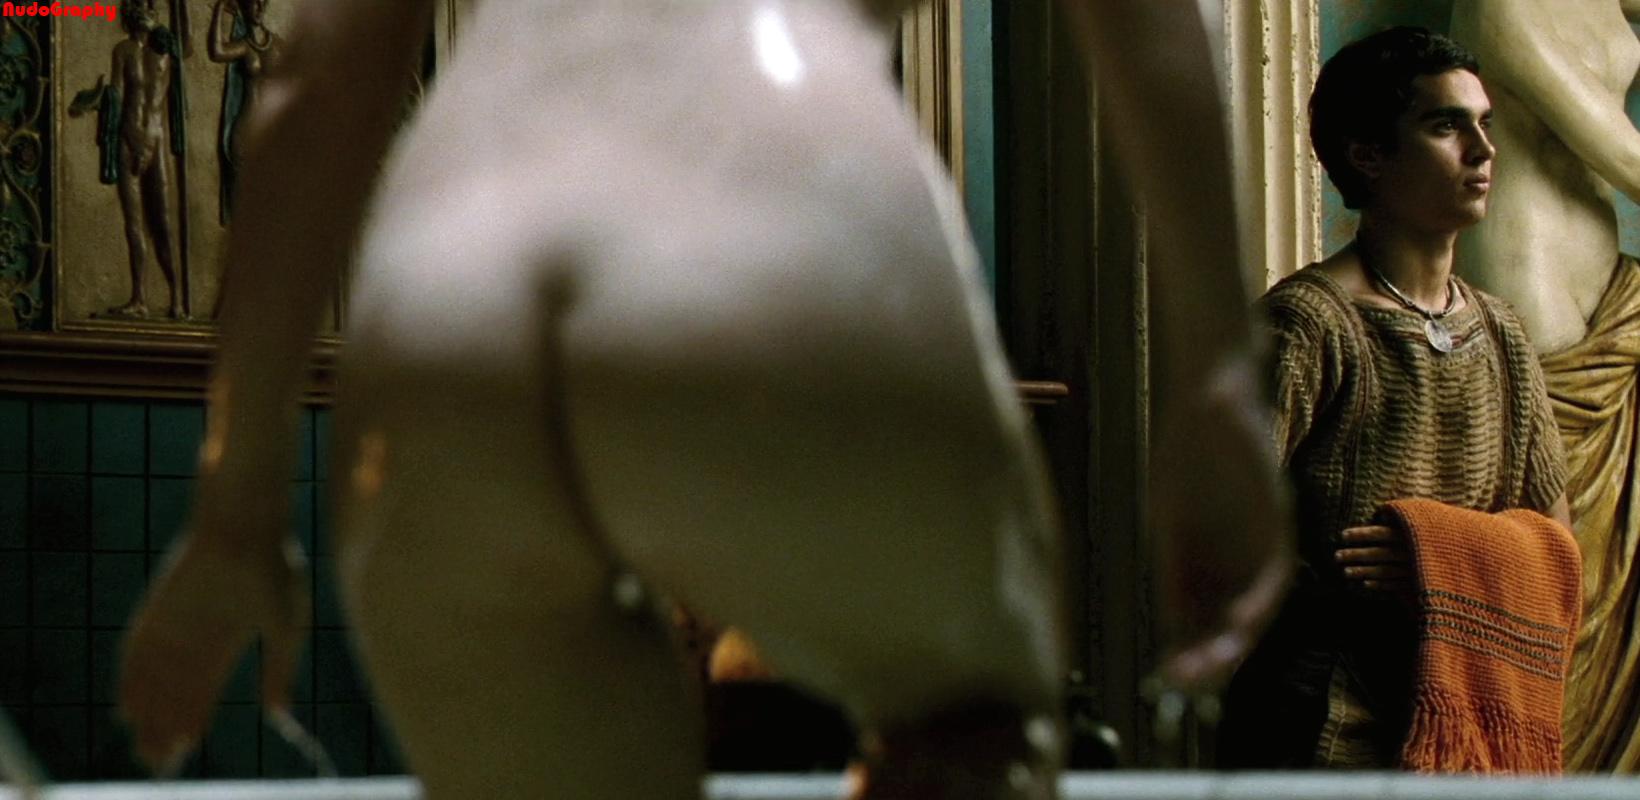 Rachel weisz nude agora